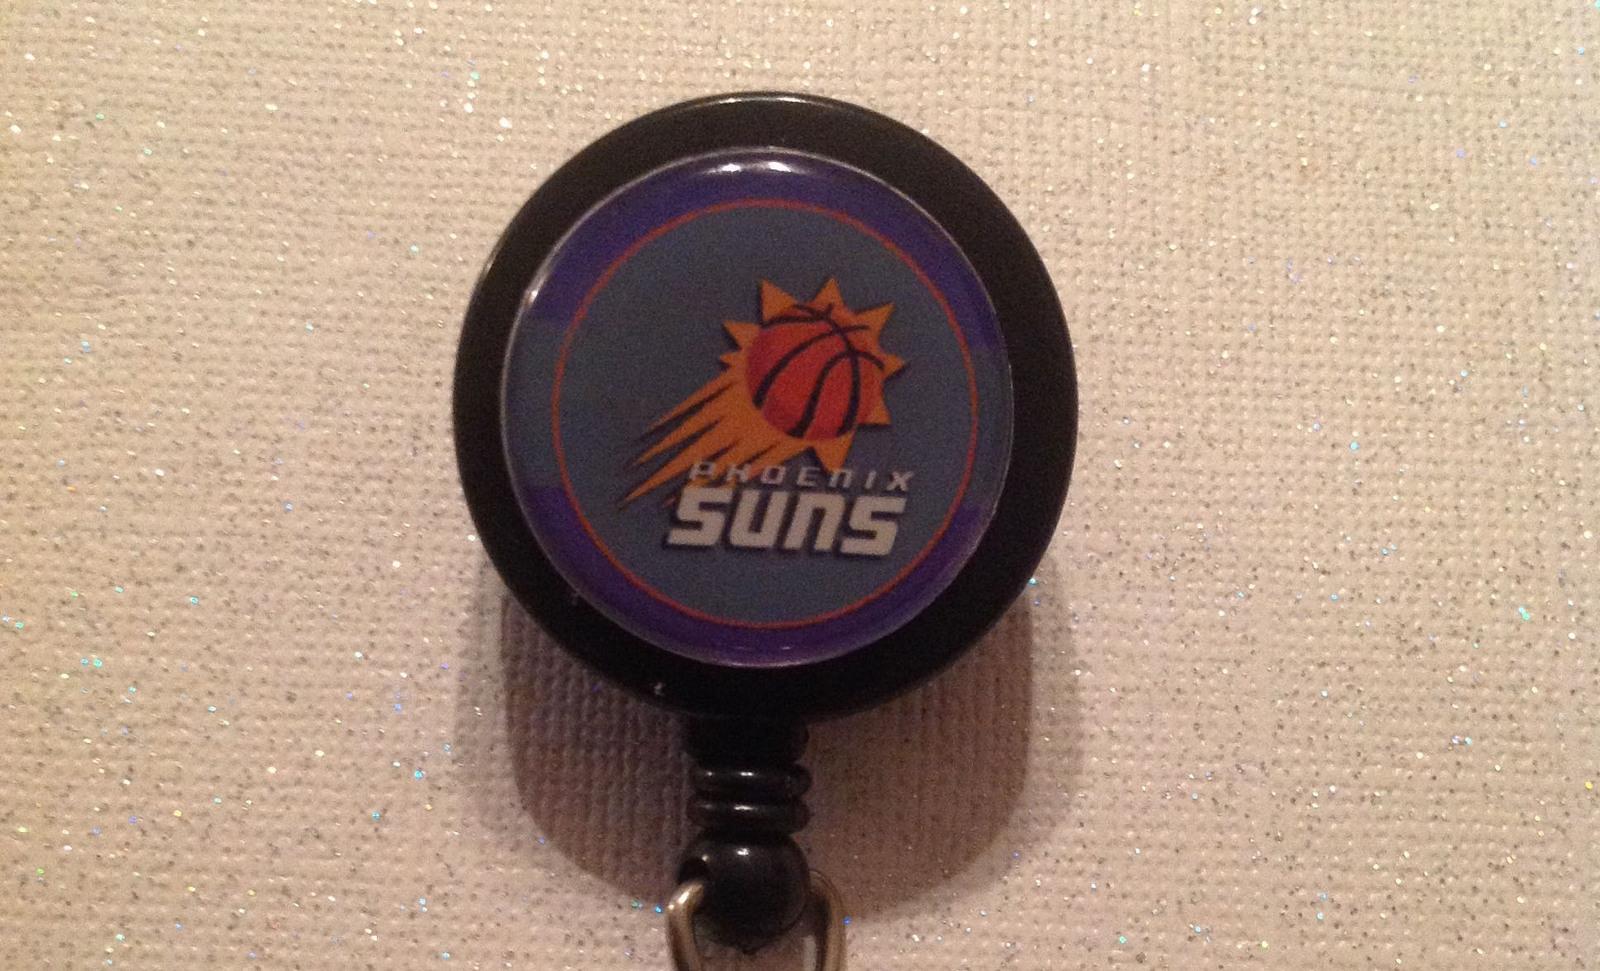 Nba Phoenix Suns Badge Reel Id Holder purple alligator clip handmade new